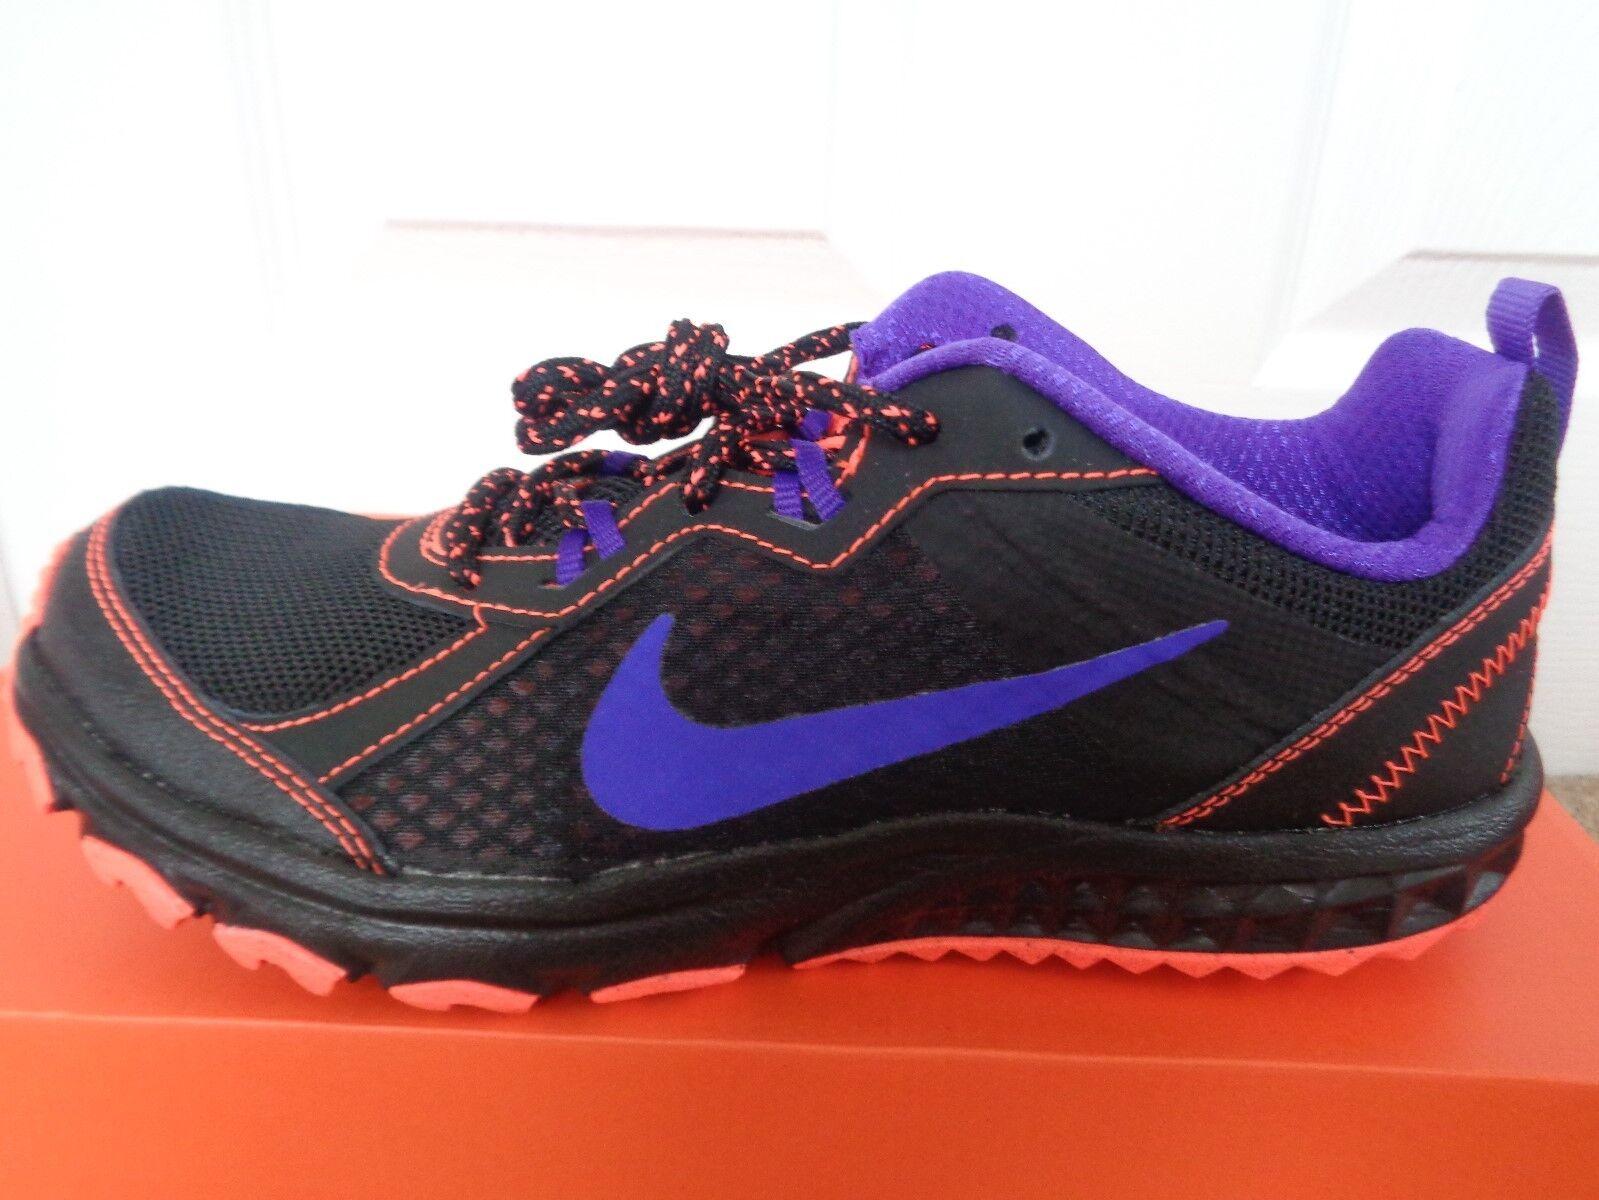 Nike Wild Trail damen trainers schuhe 643074 022 uk 5 eu 38.5 us 7.5 NEW+BOX